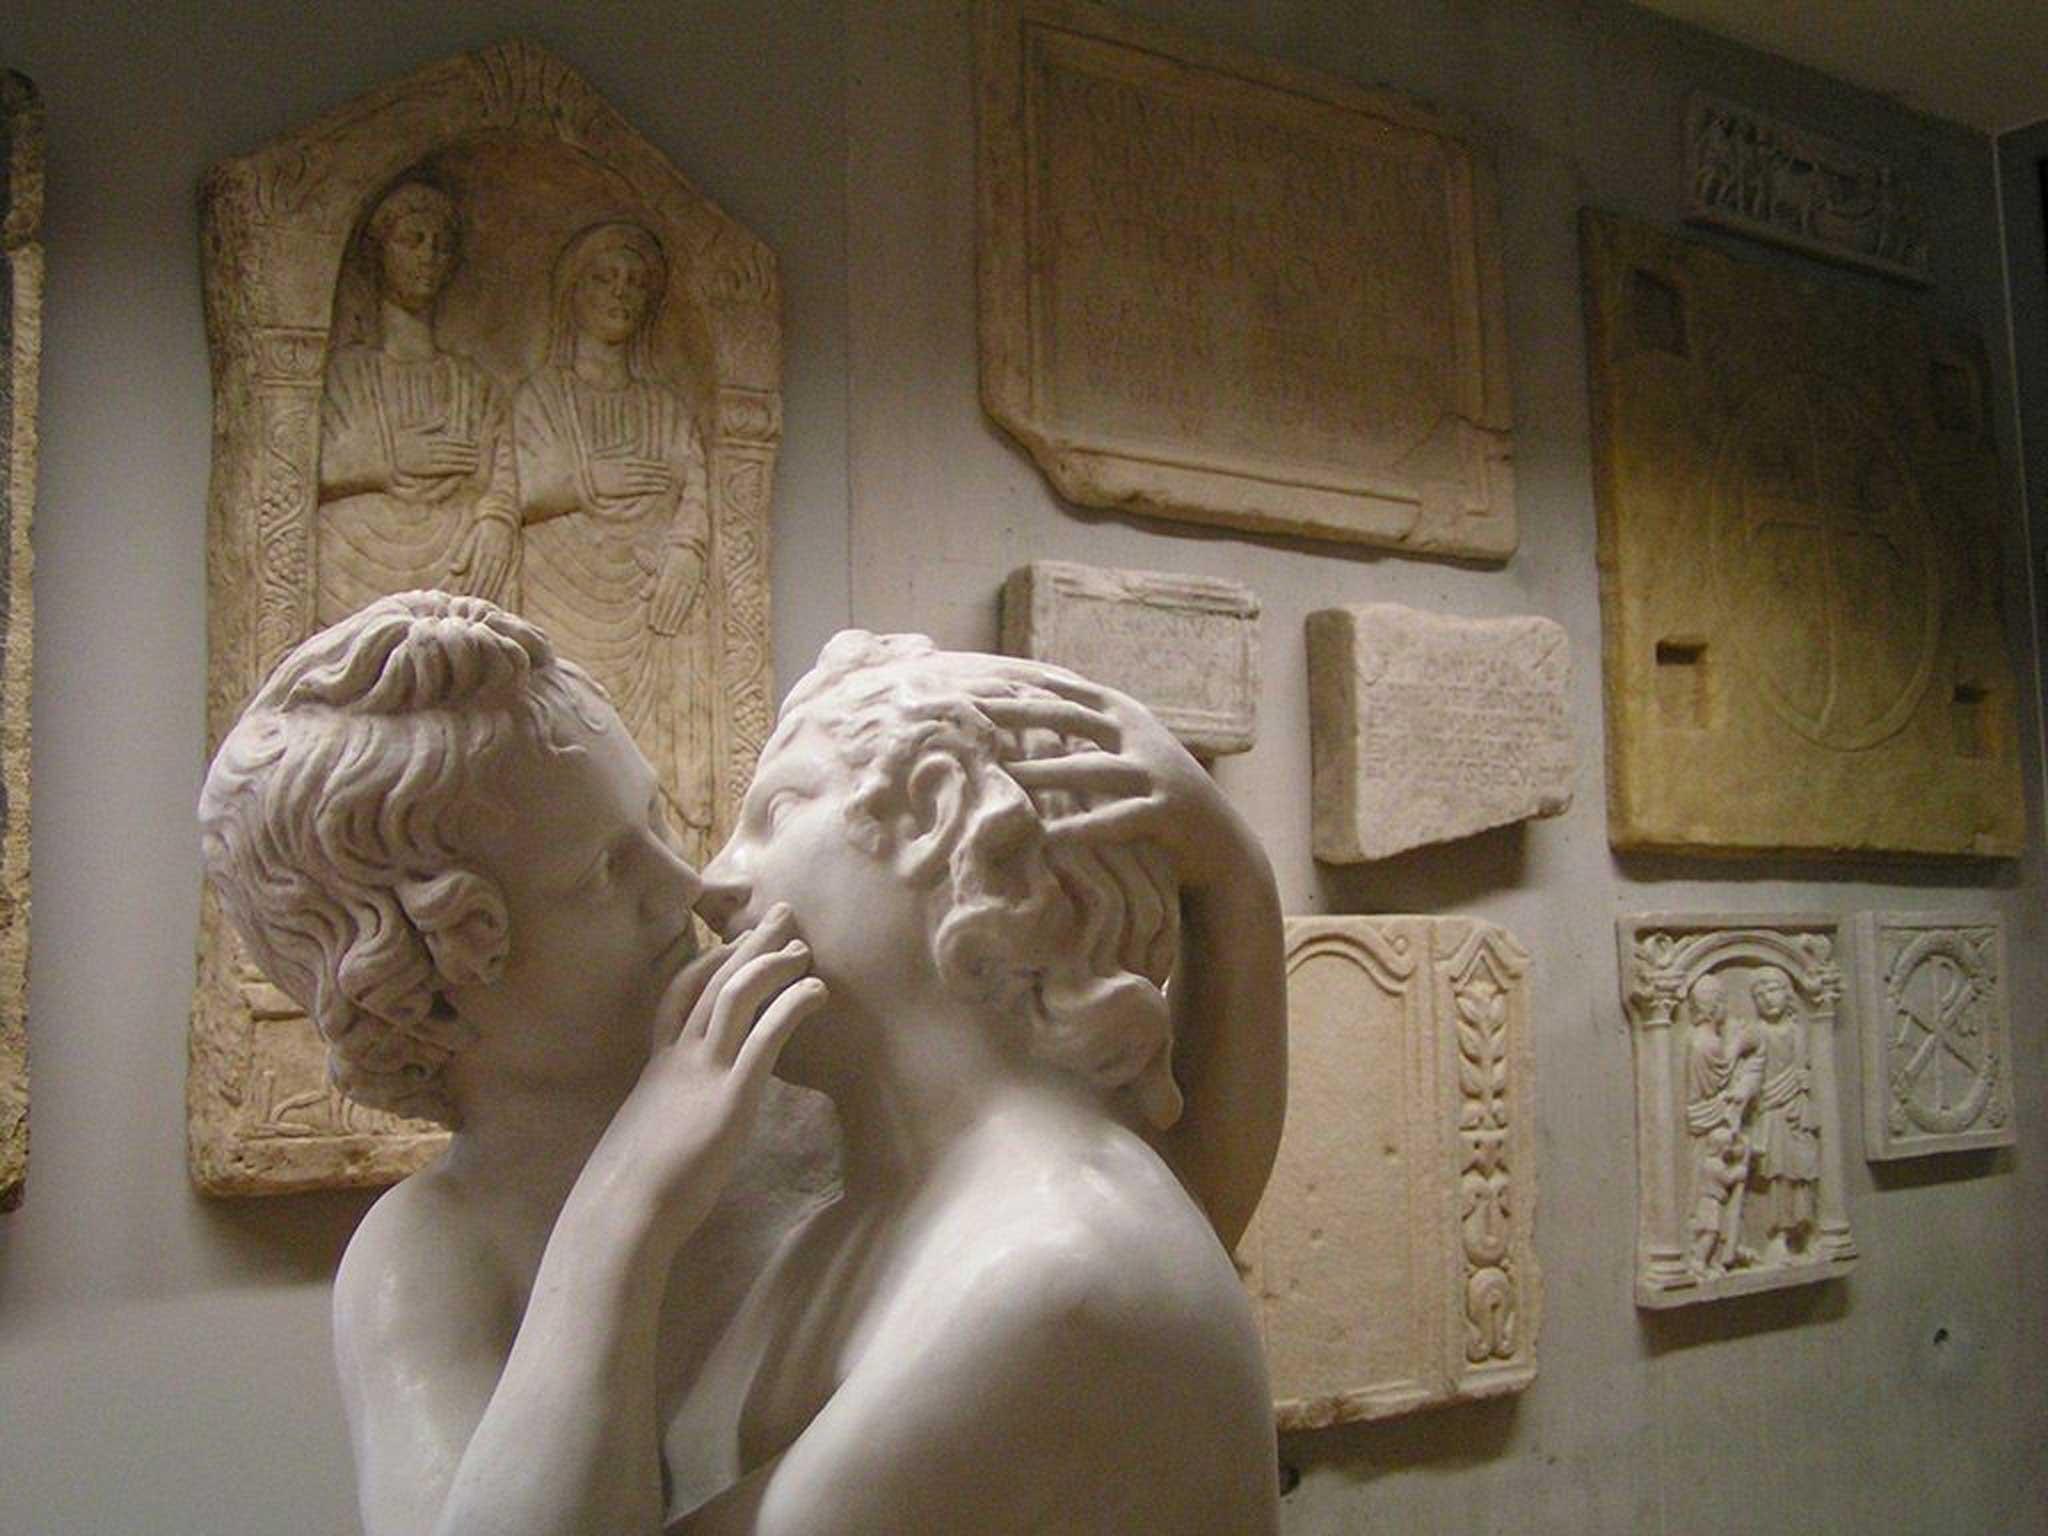 Archäologisches Museum Innsbruck